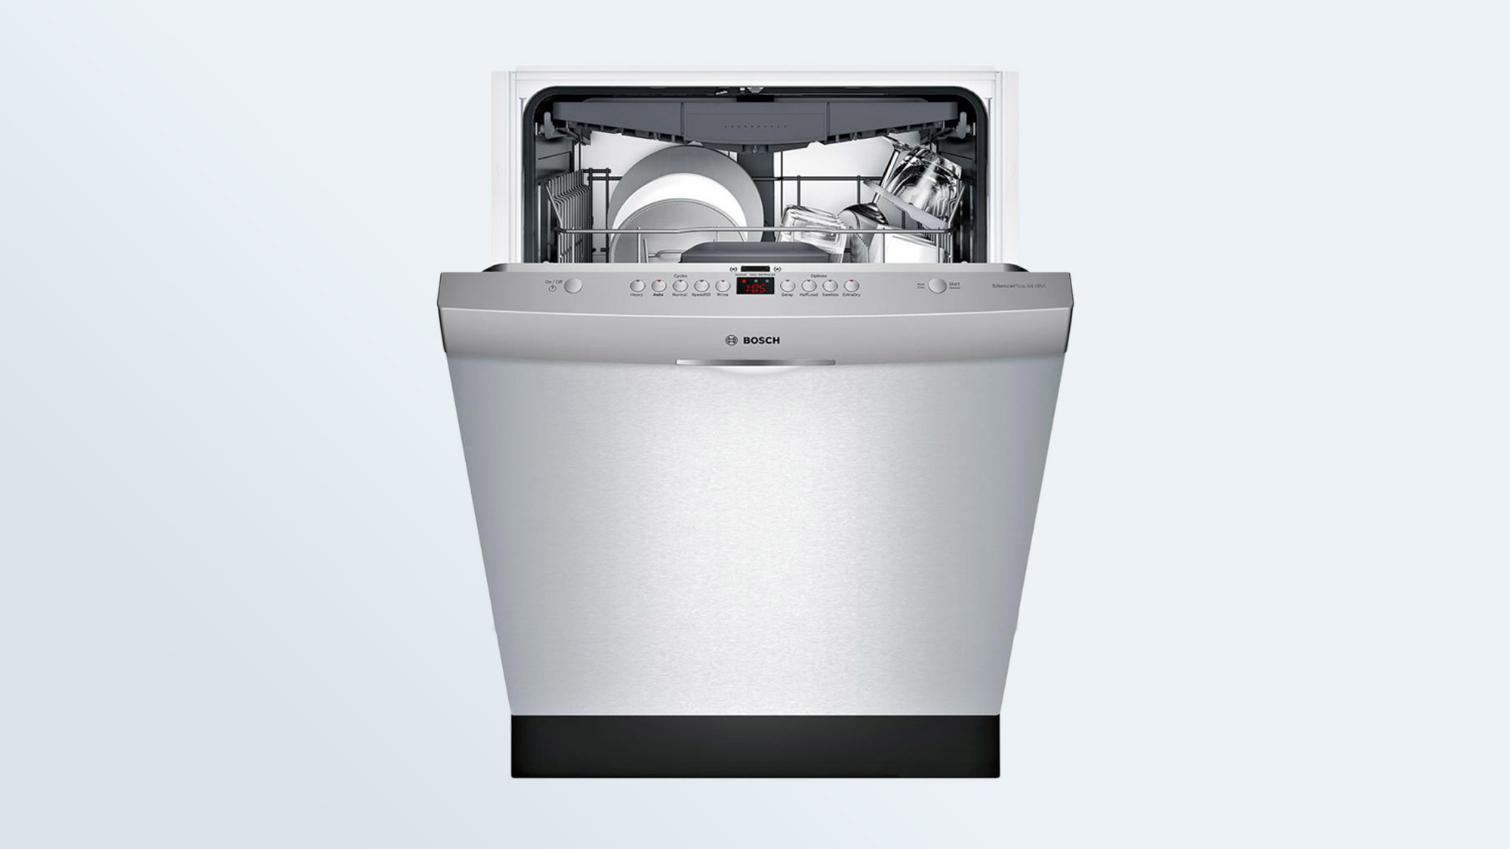 Best dishwashers: Bosch 300 Series SHSM63W55N